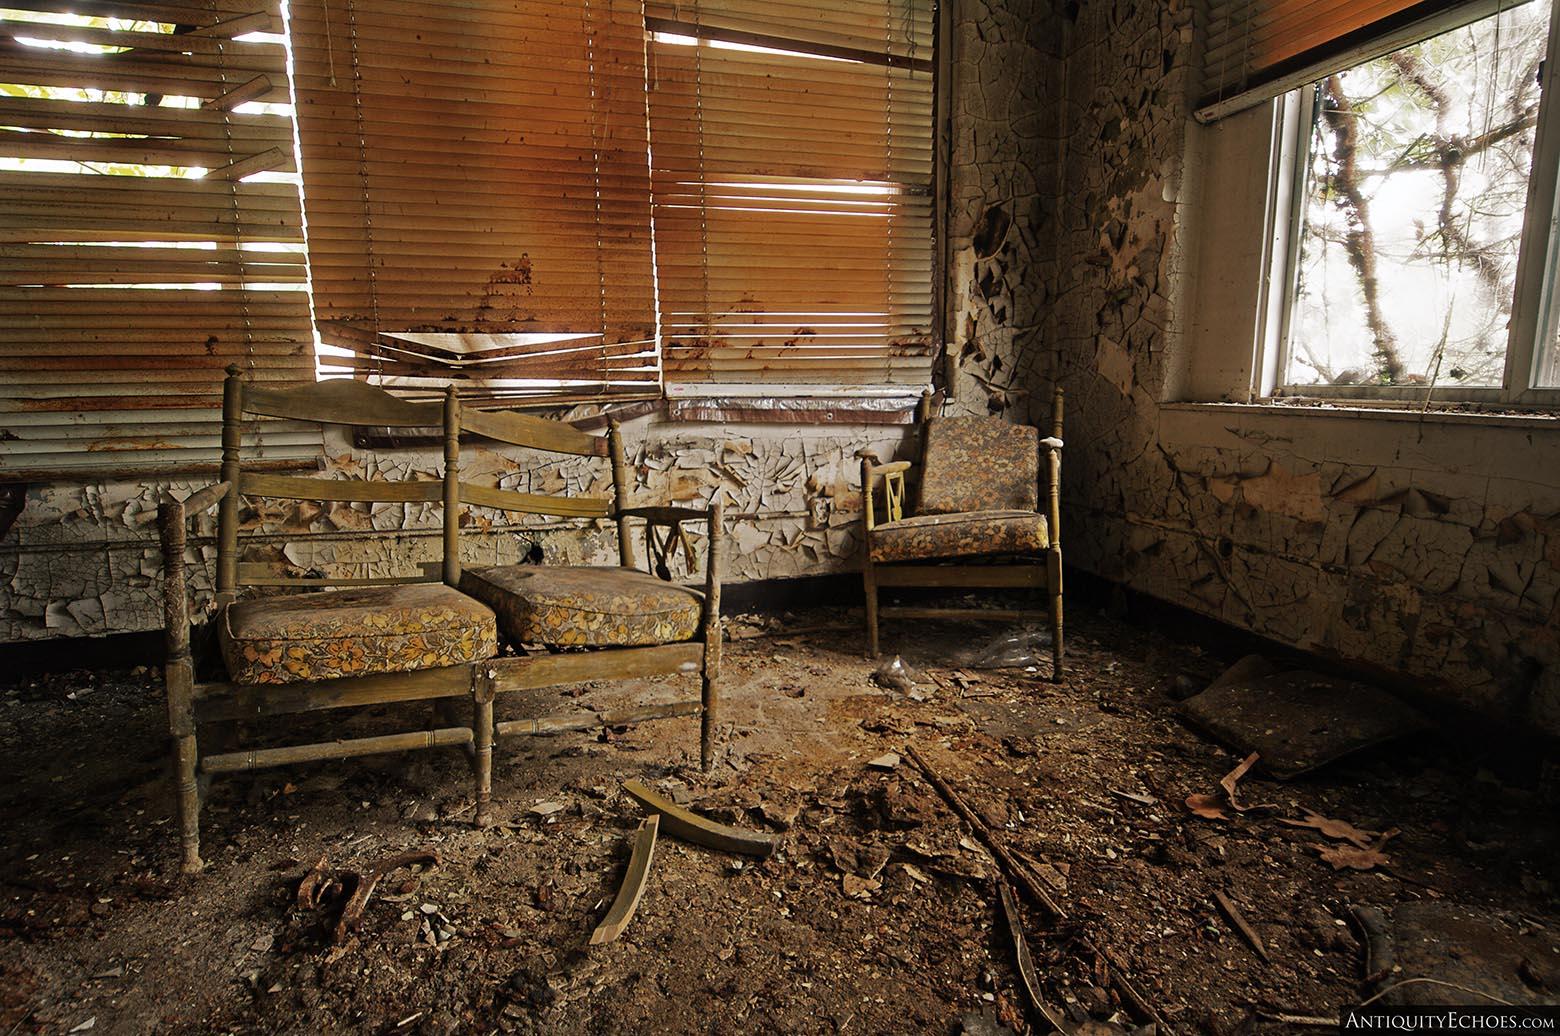 Brownsville General Hospital - Floral Sitting Area